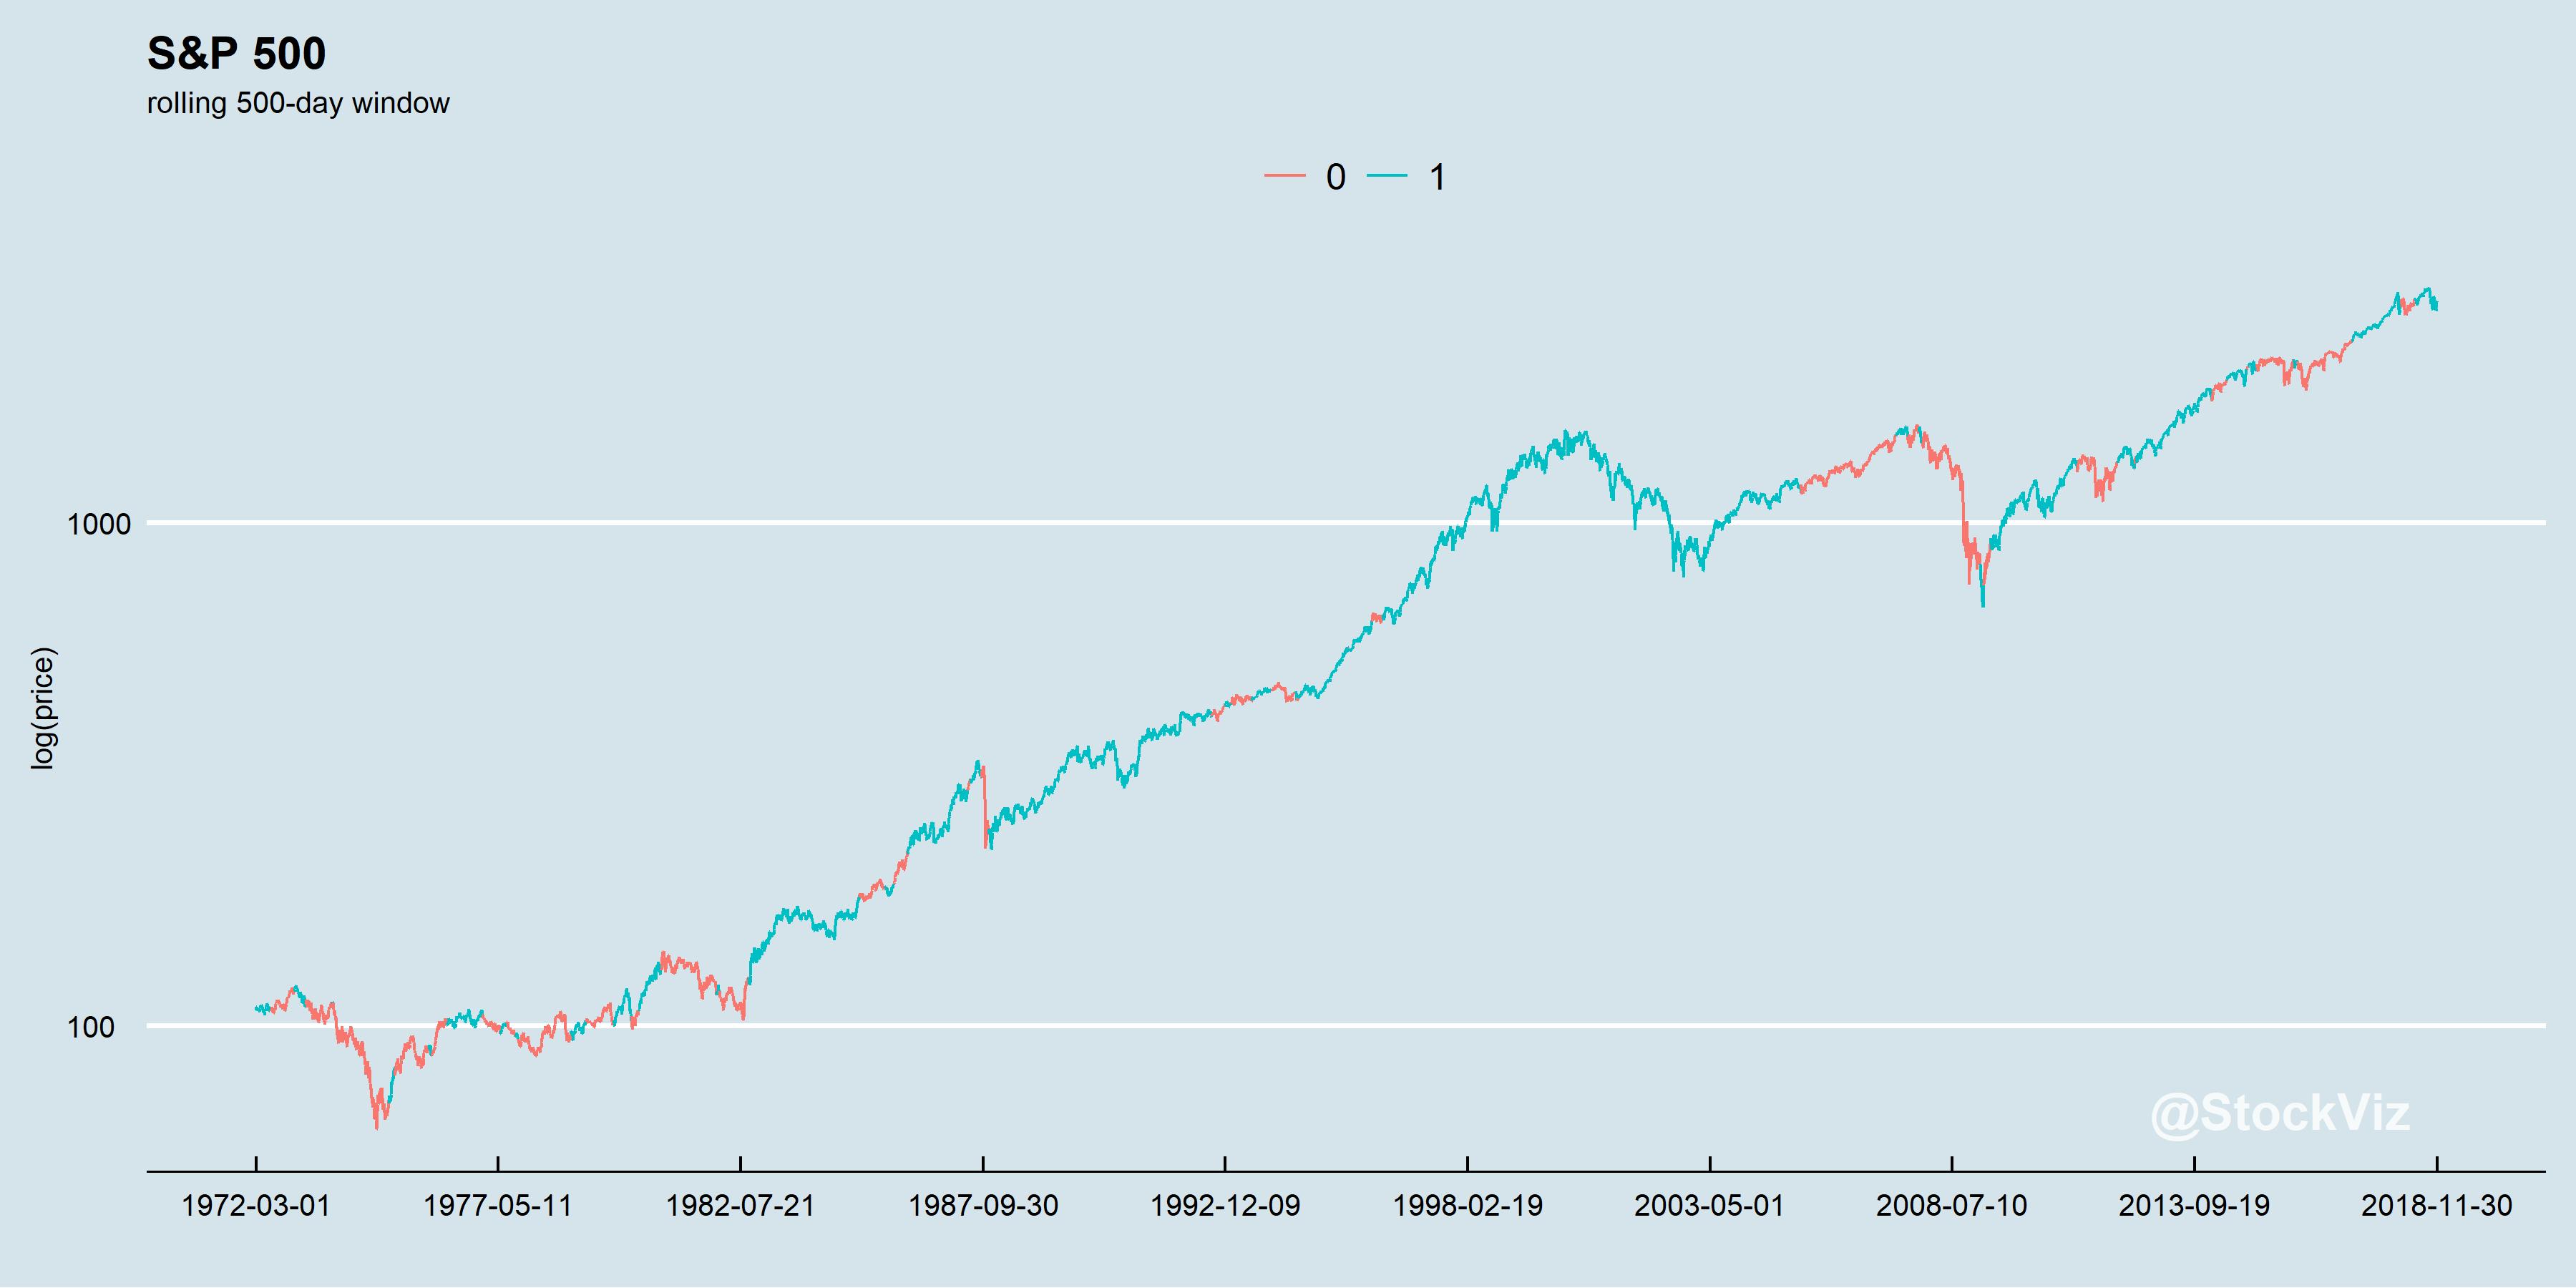 S&P 500 regimes